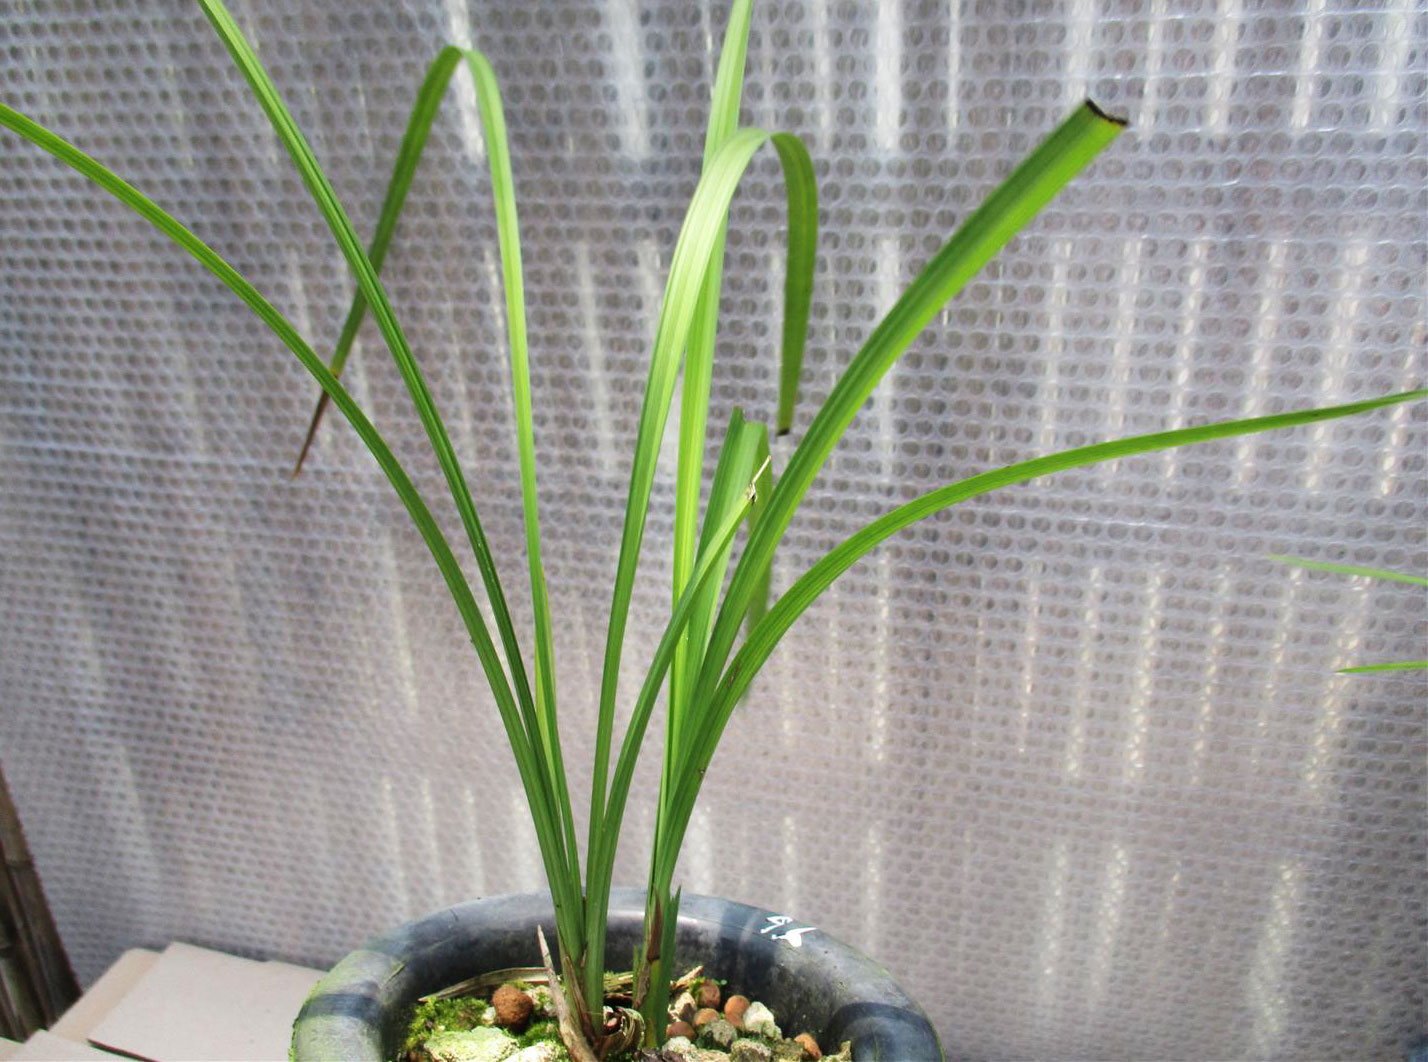 春建银杆素Cym.tortisepalum var.longibracteatum'Yin Gan Su'